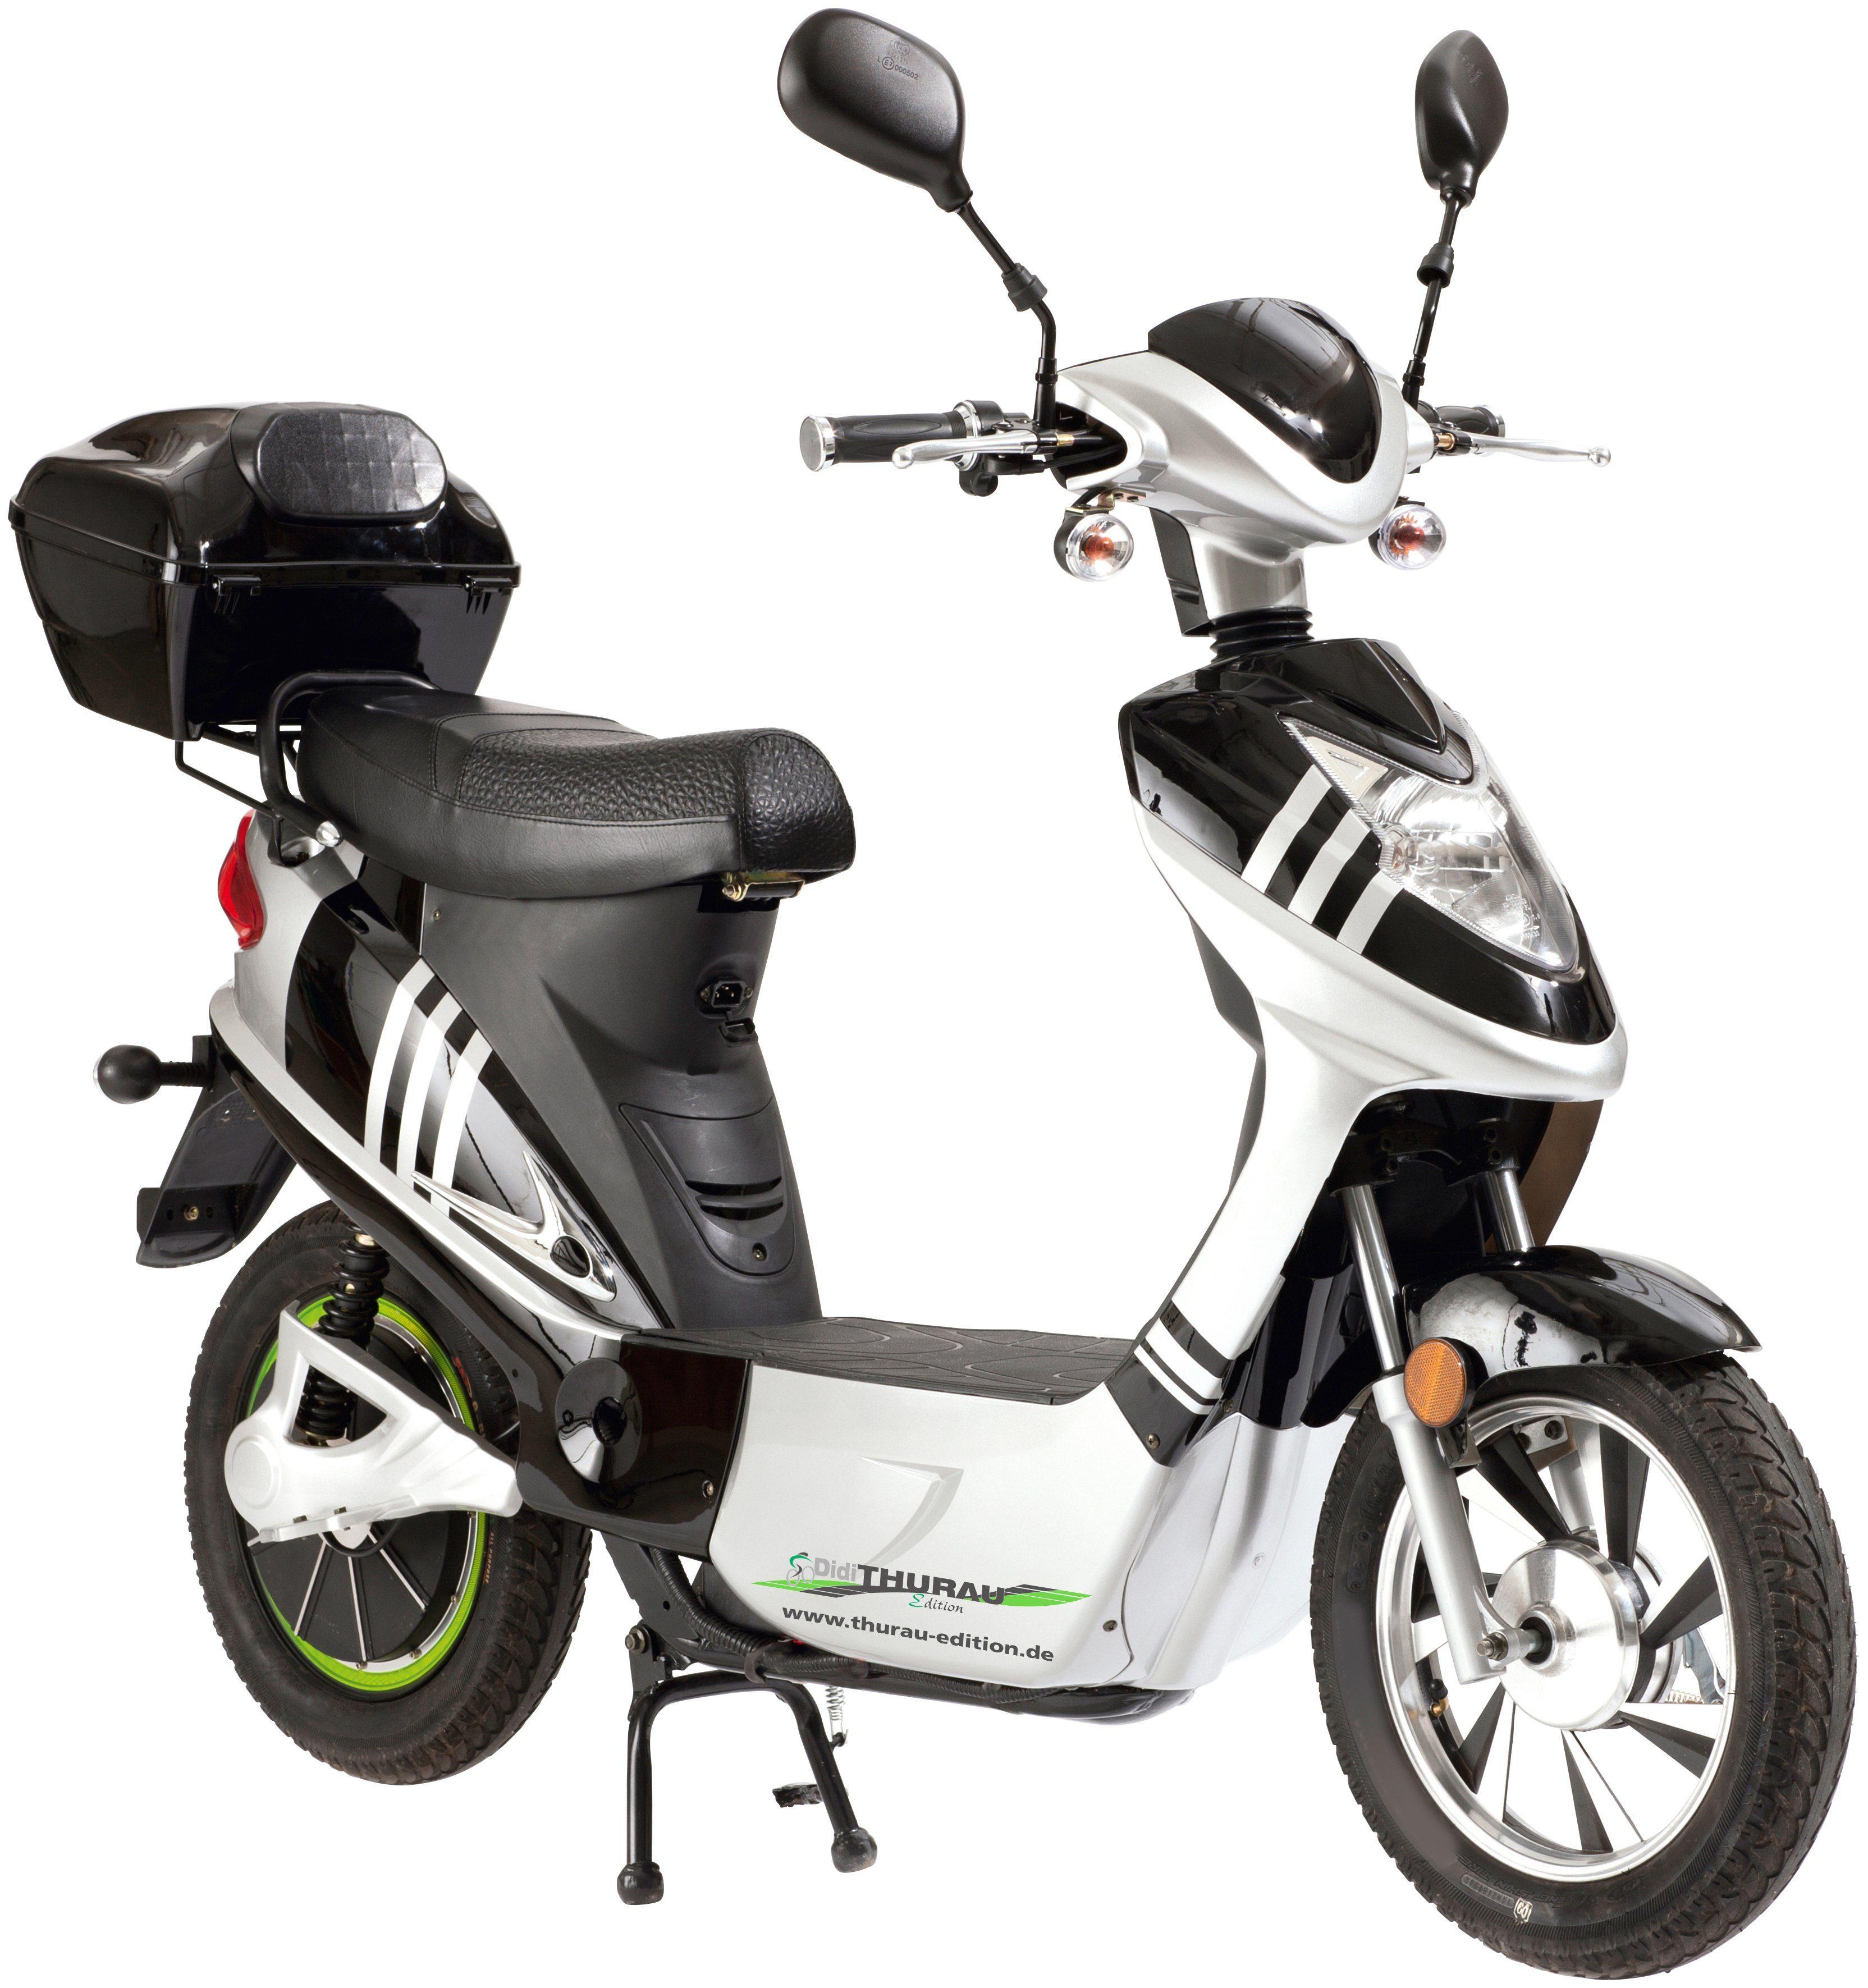 DIDI THURAU E-Scooter »City Star«, 20 km/h, Inkl. Rundum-Sorglos-Paket